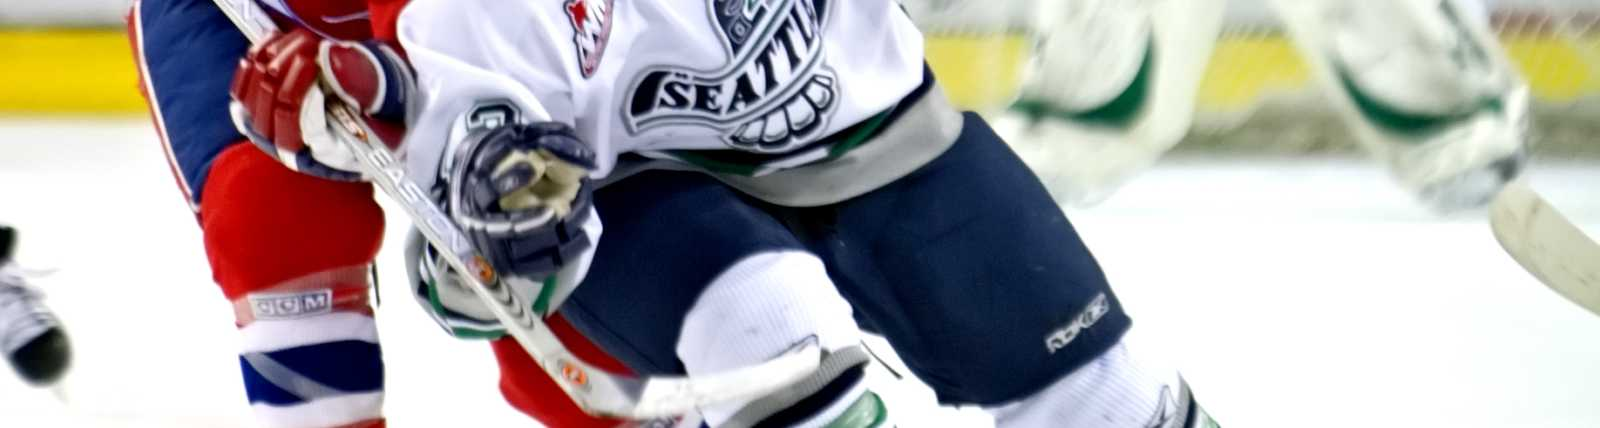 Seattle_Thunderbirds_Hockey-4.jpg